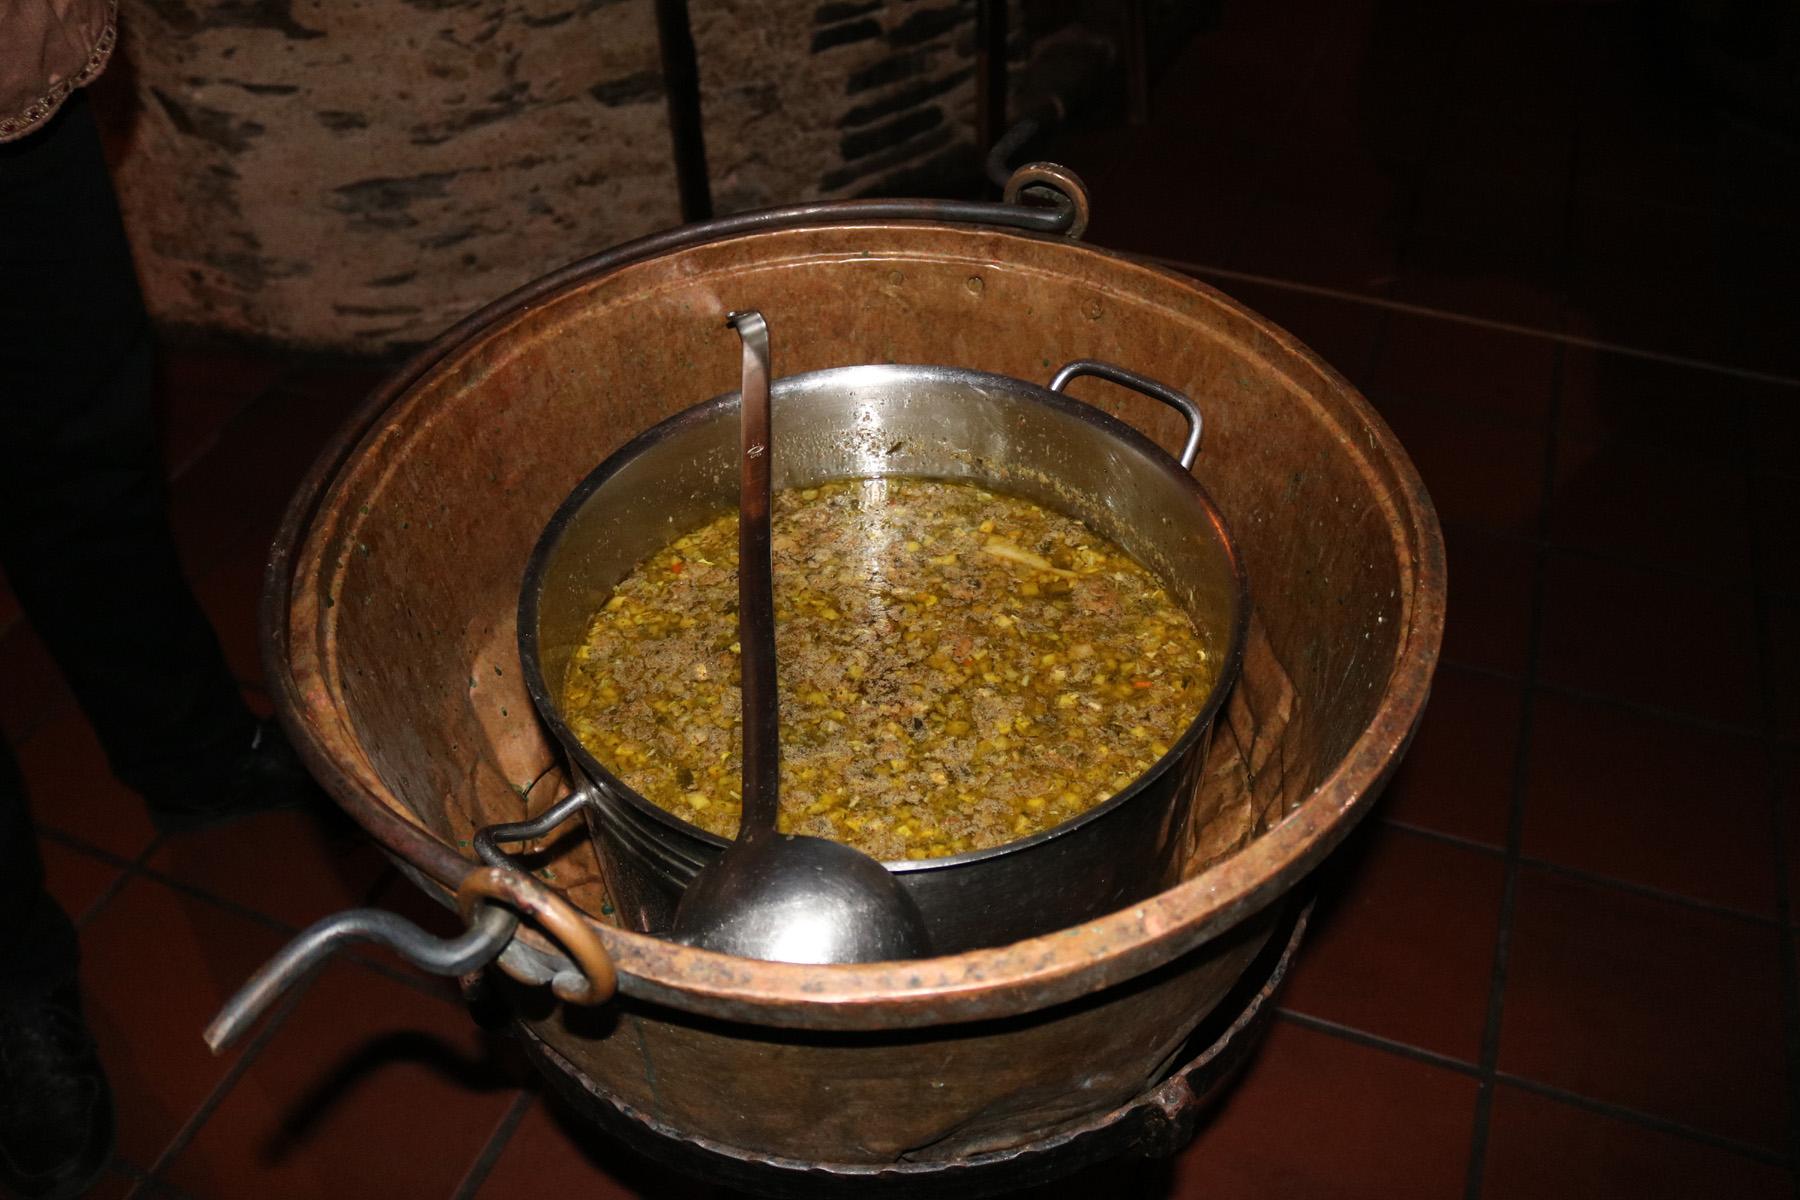 Suppe aus dem Kessel